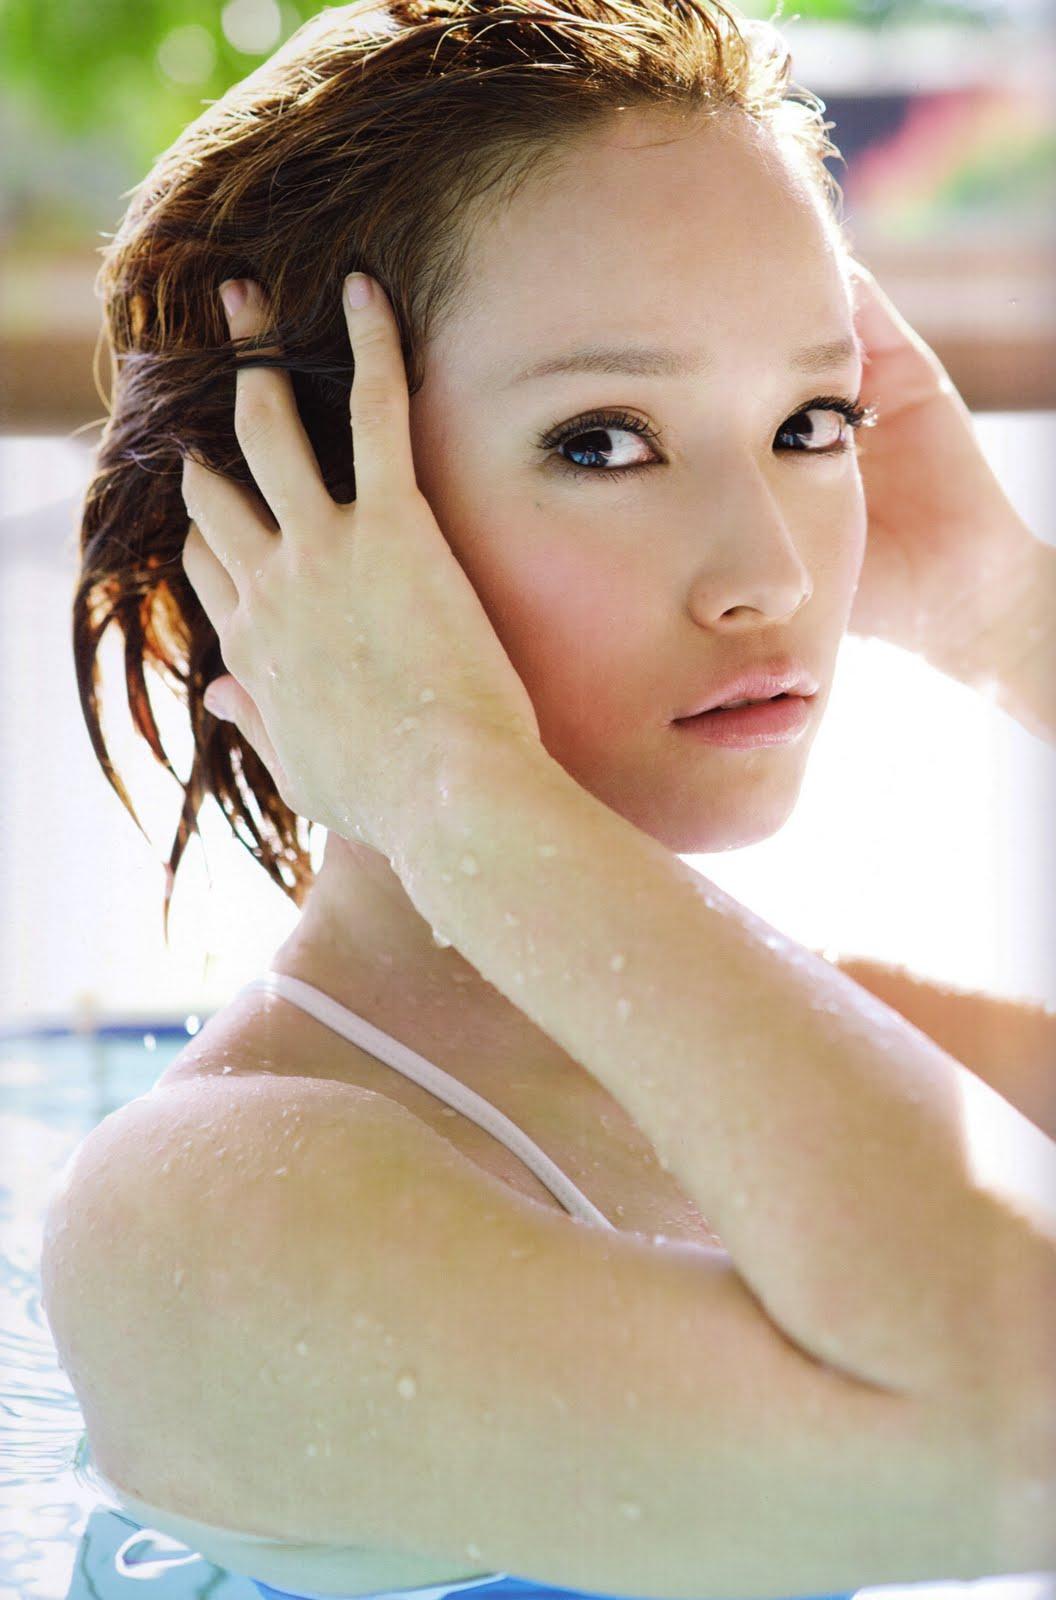 http://3.bp.blogspot.com/_hJVox6-vy_4/TR6nsrFQT0I/AAAAAAAADnk/H5vC0seDD7o/s1600/Kamei%2BEri%2Bin%2Bgym%2Band%2Bswimming%2Bpool08.jpg